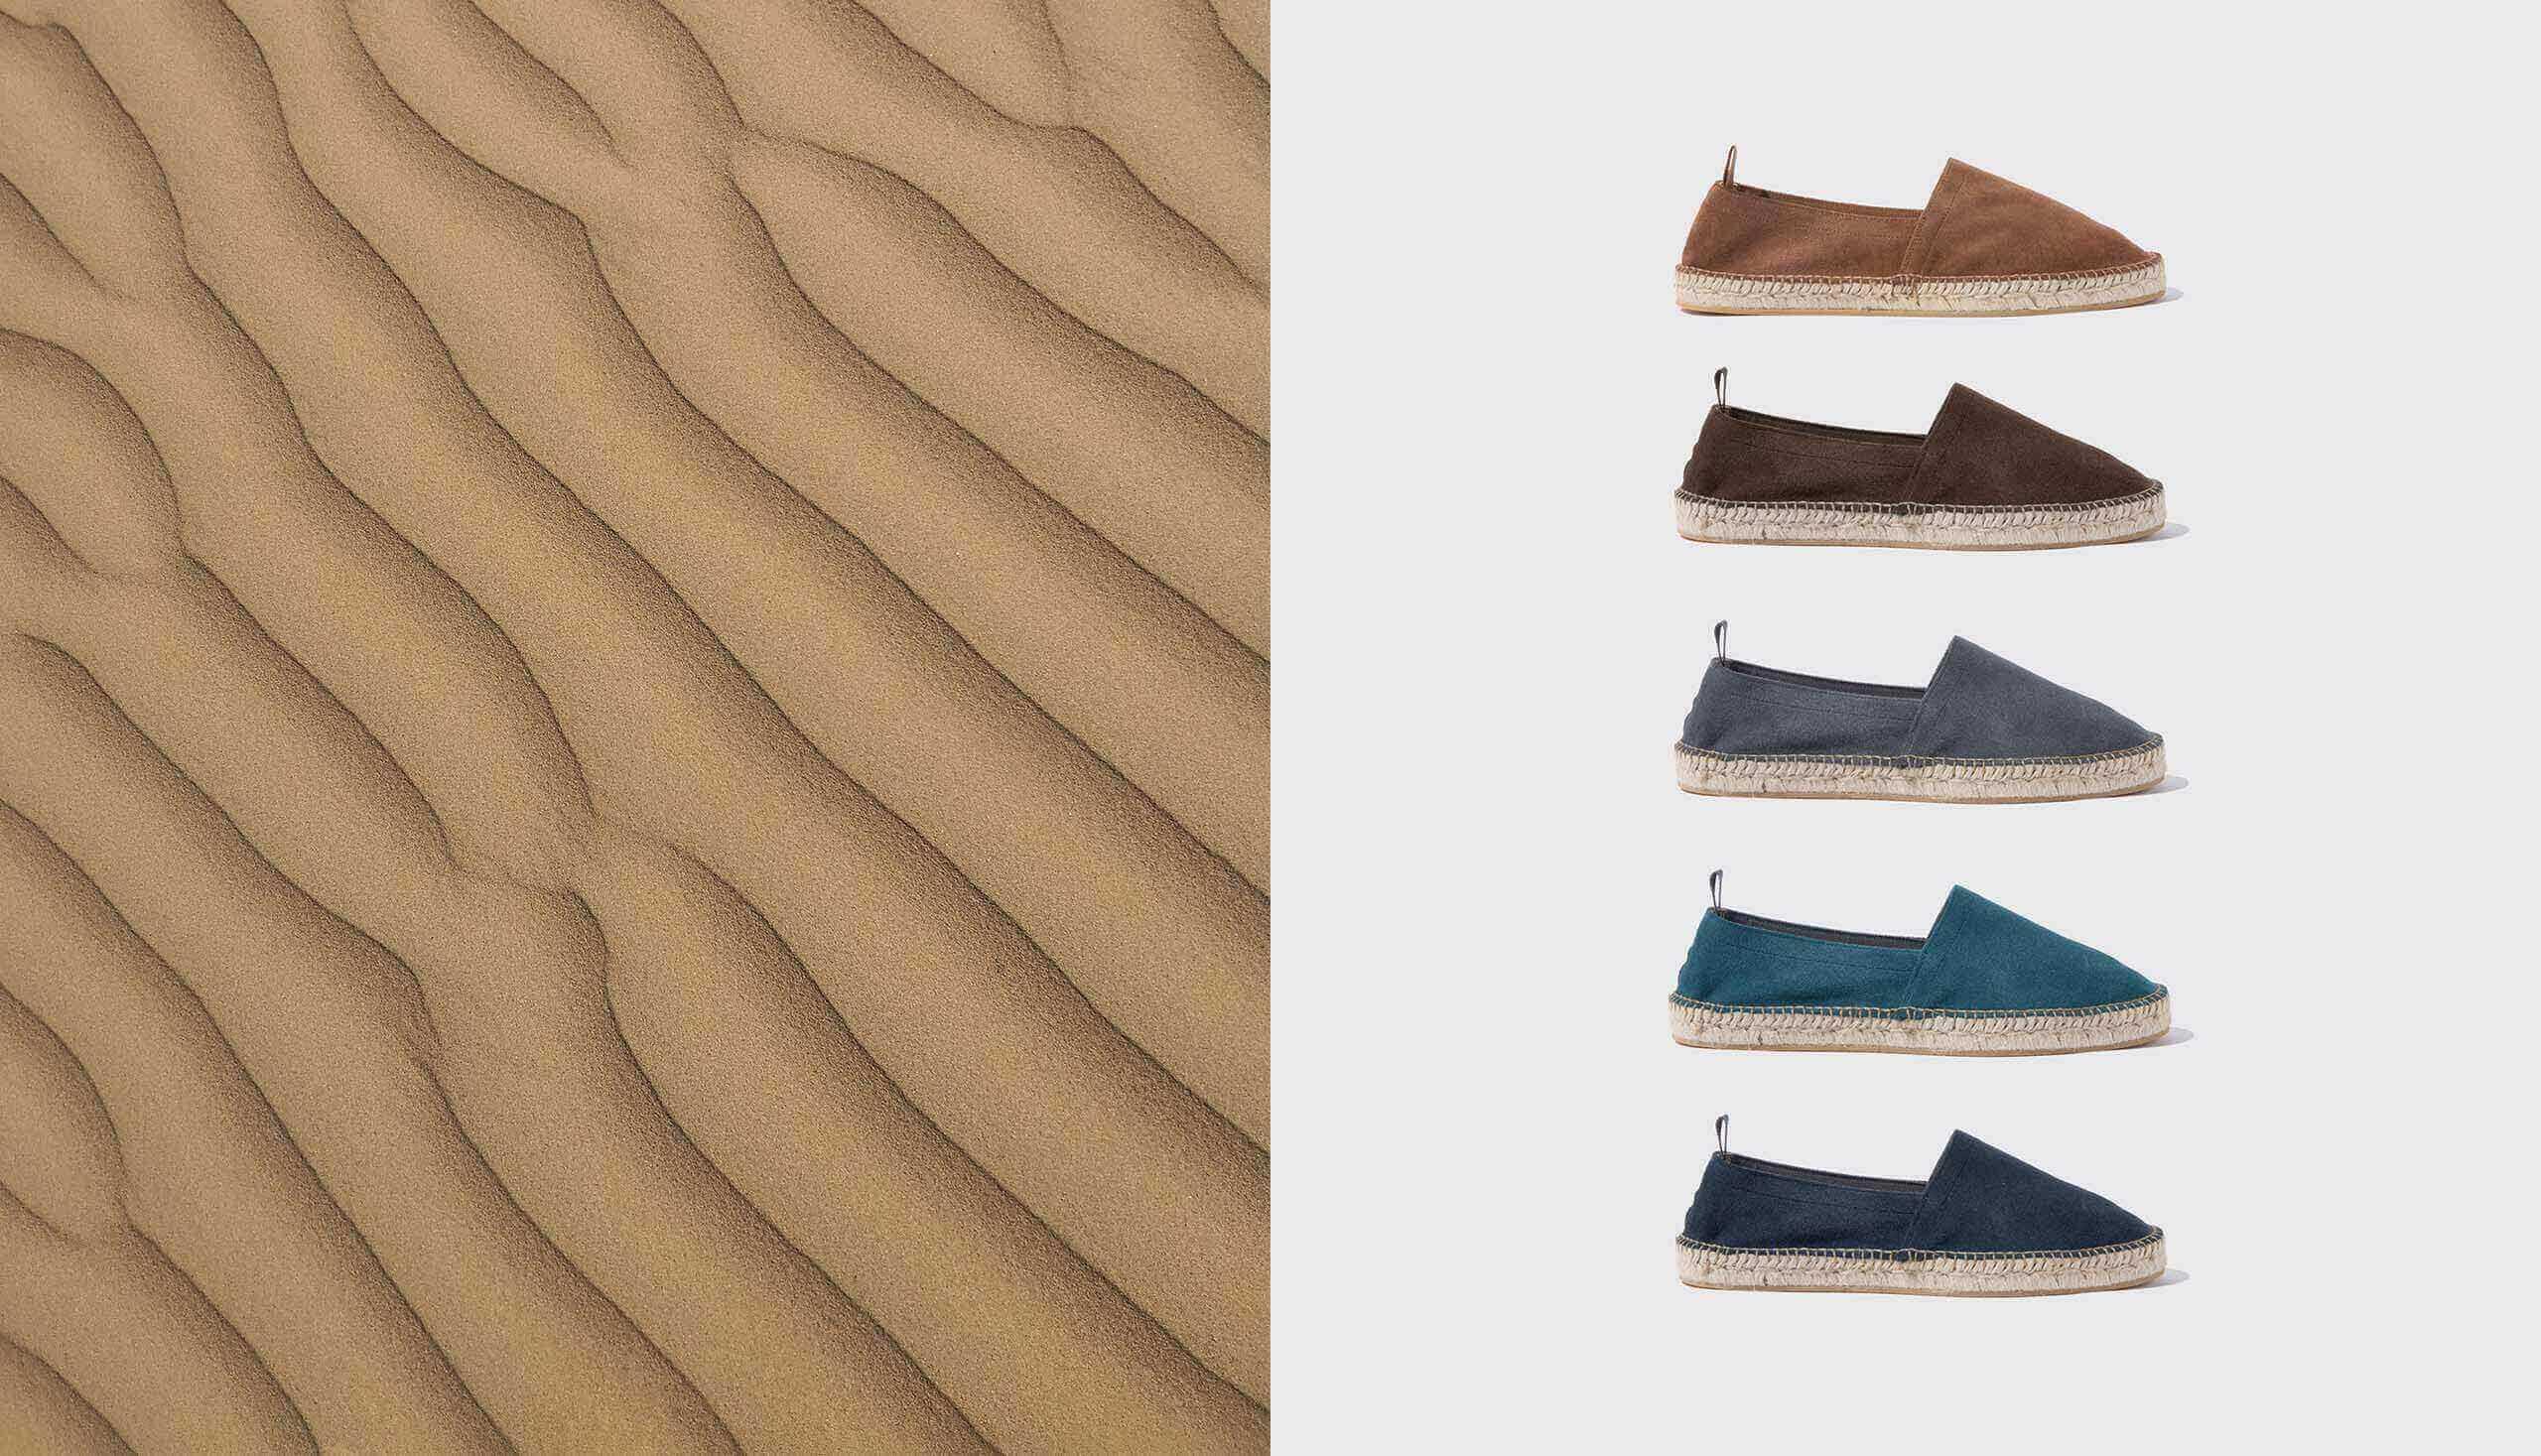 49e8bbe6da6d1 Scarosso - Luxury Italian shoes for Men and Women